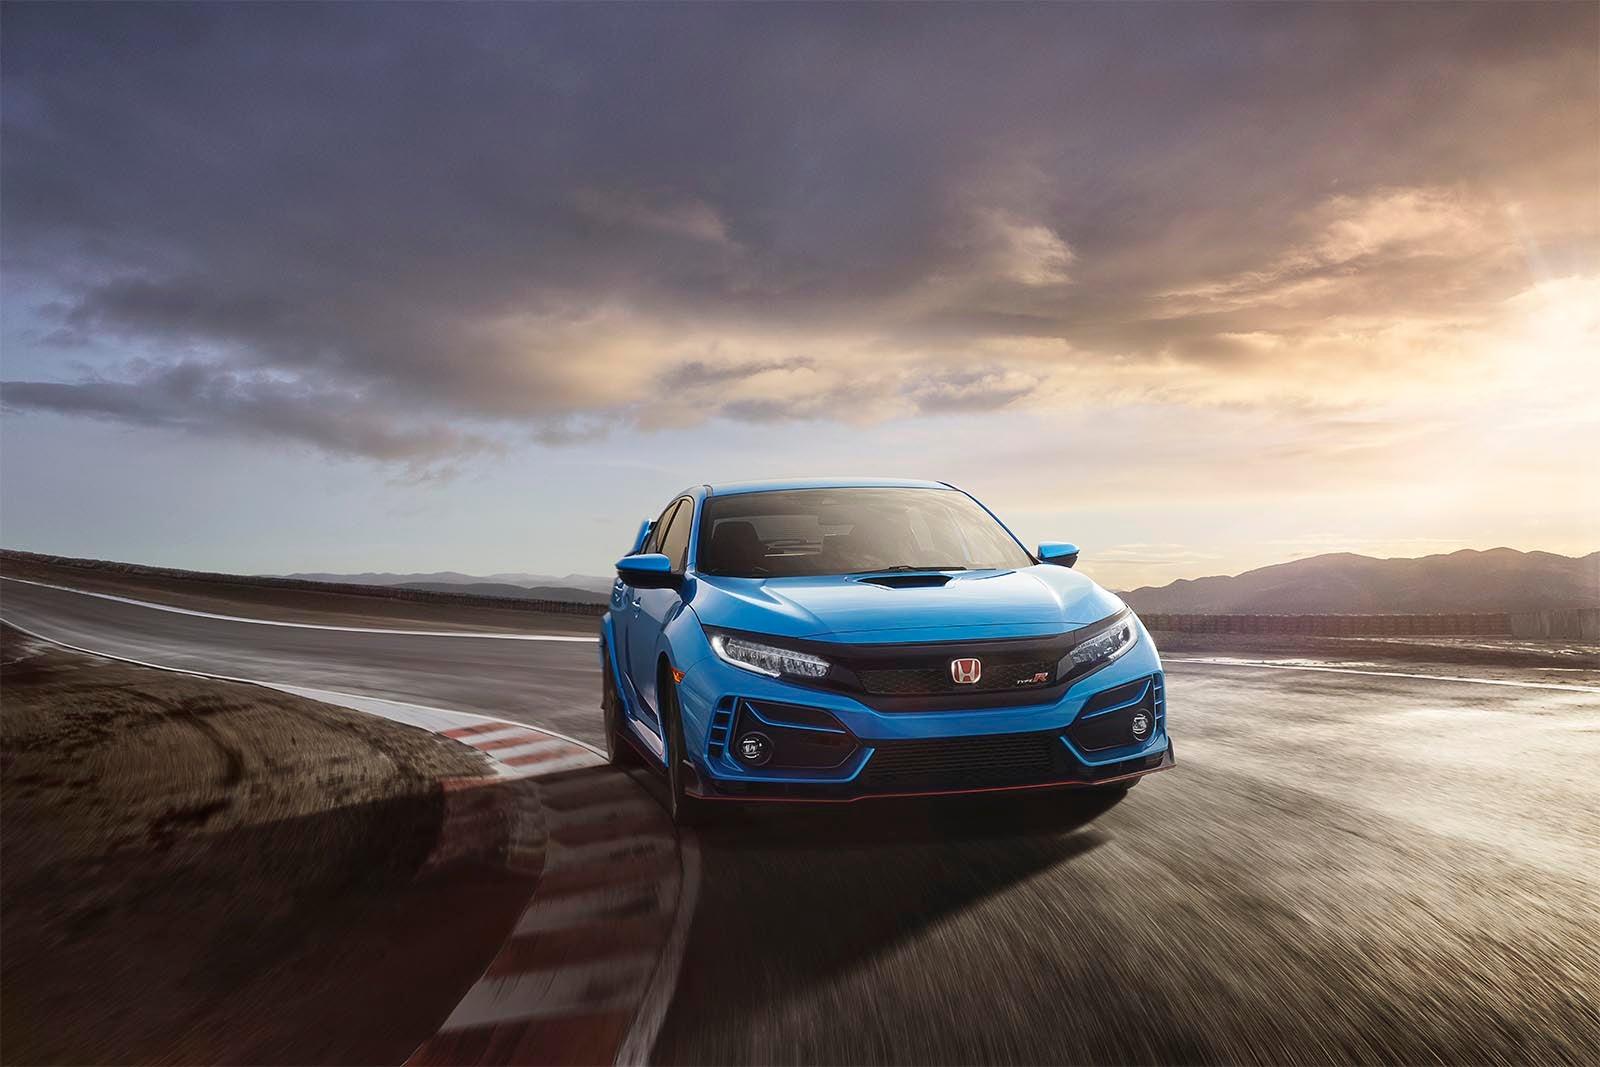 First Drive: 2020 Honda Civic Type R | TheDetroitBureau.com